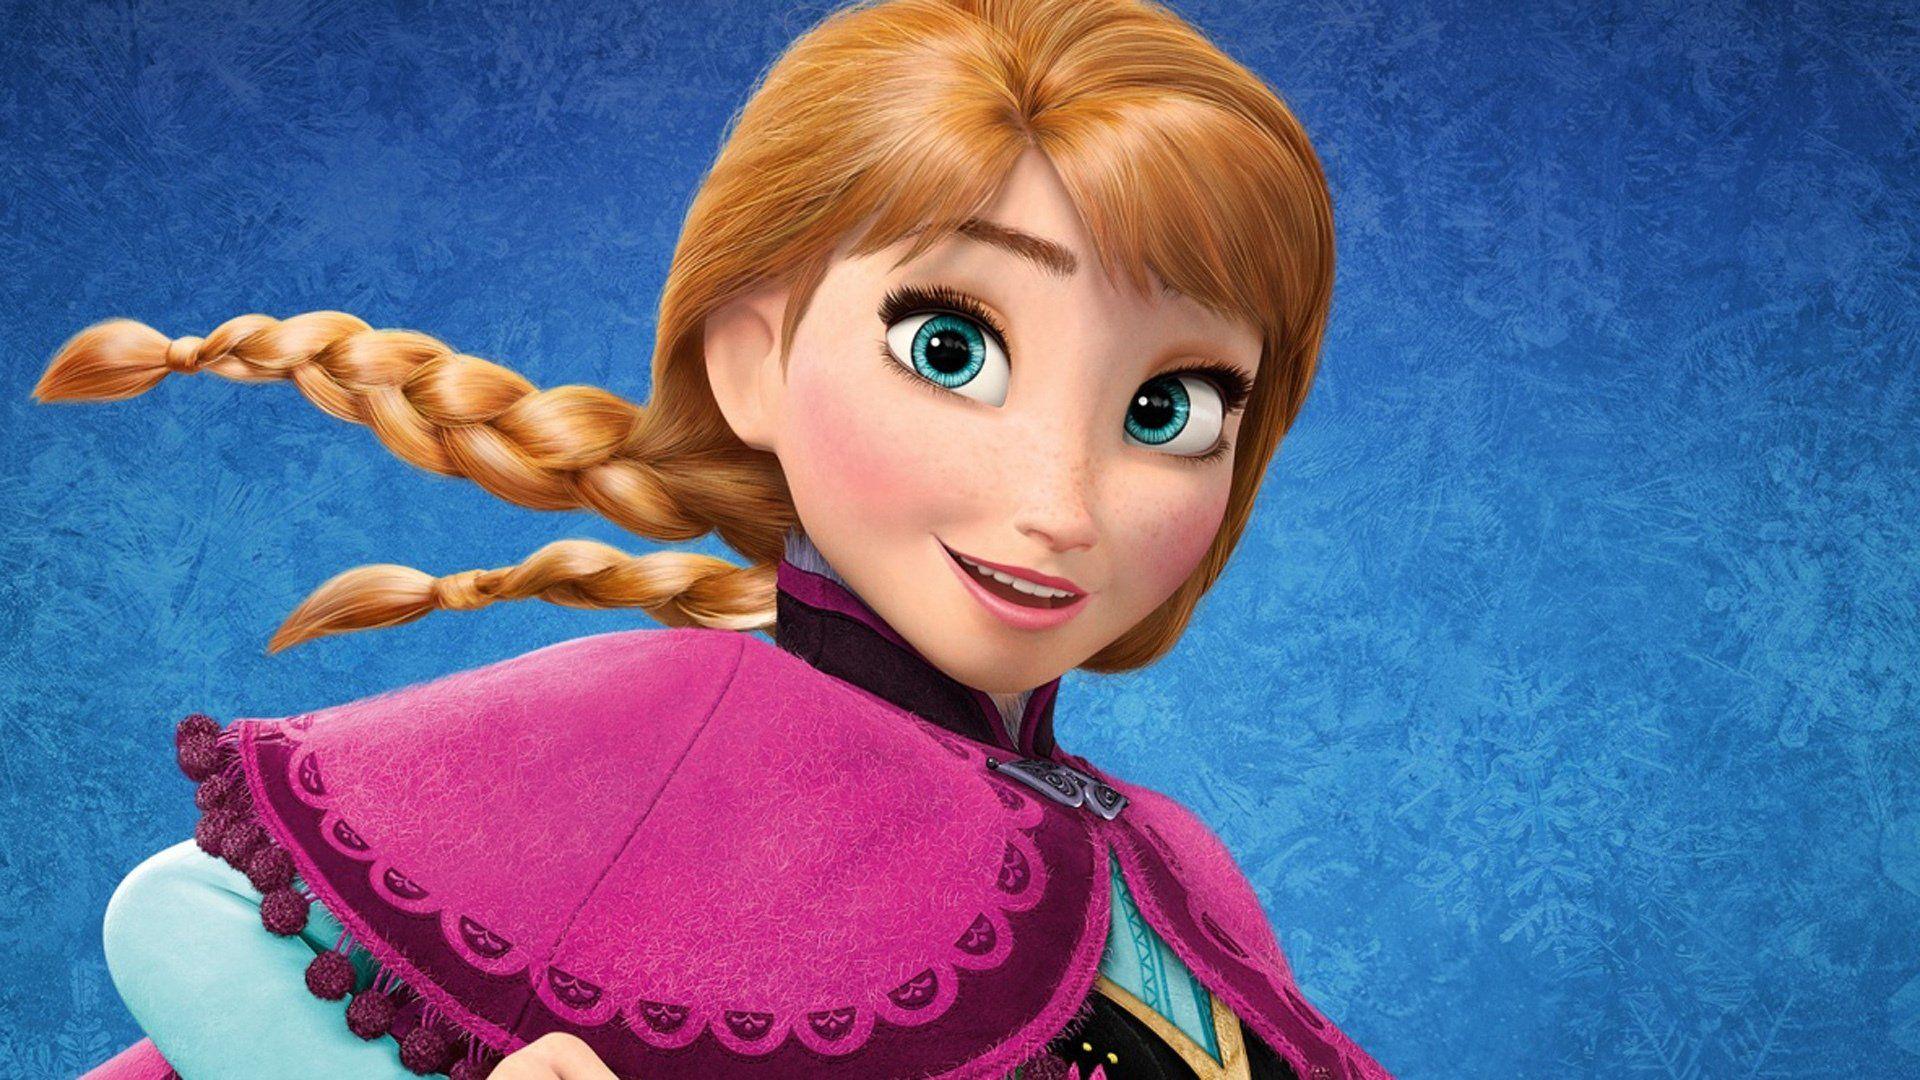 Cute Princess Anna Disney Frozen Wallpaper Vinyal Cuts